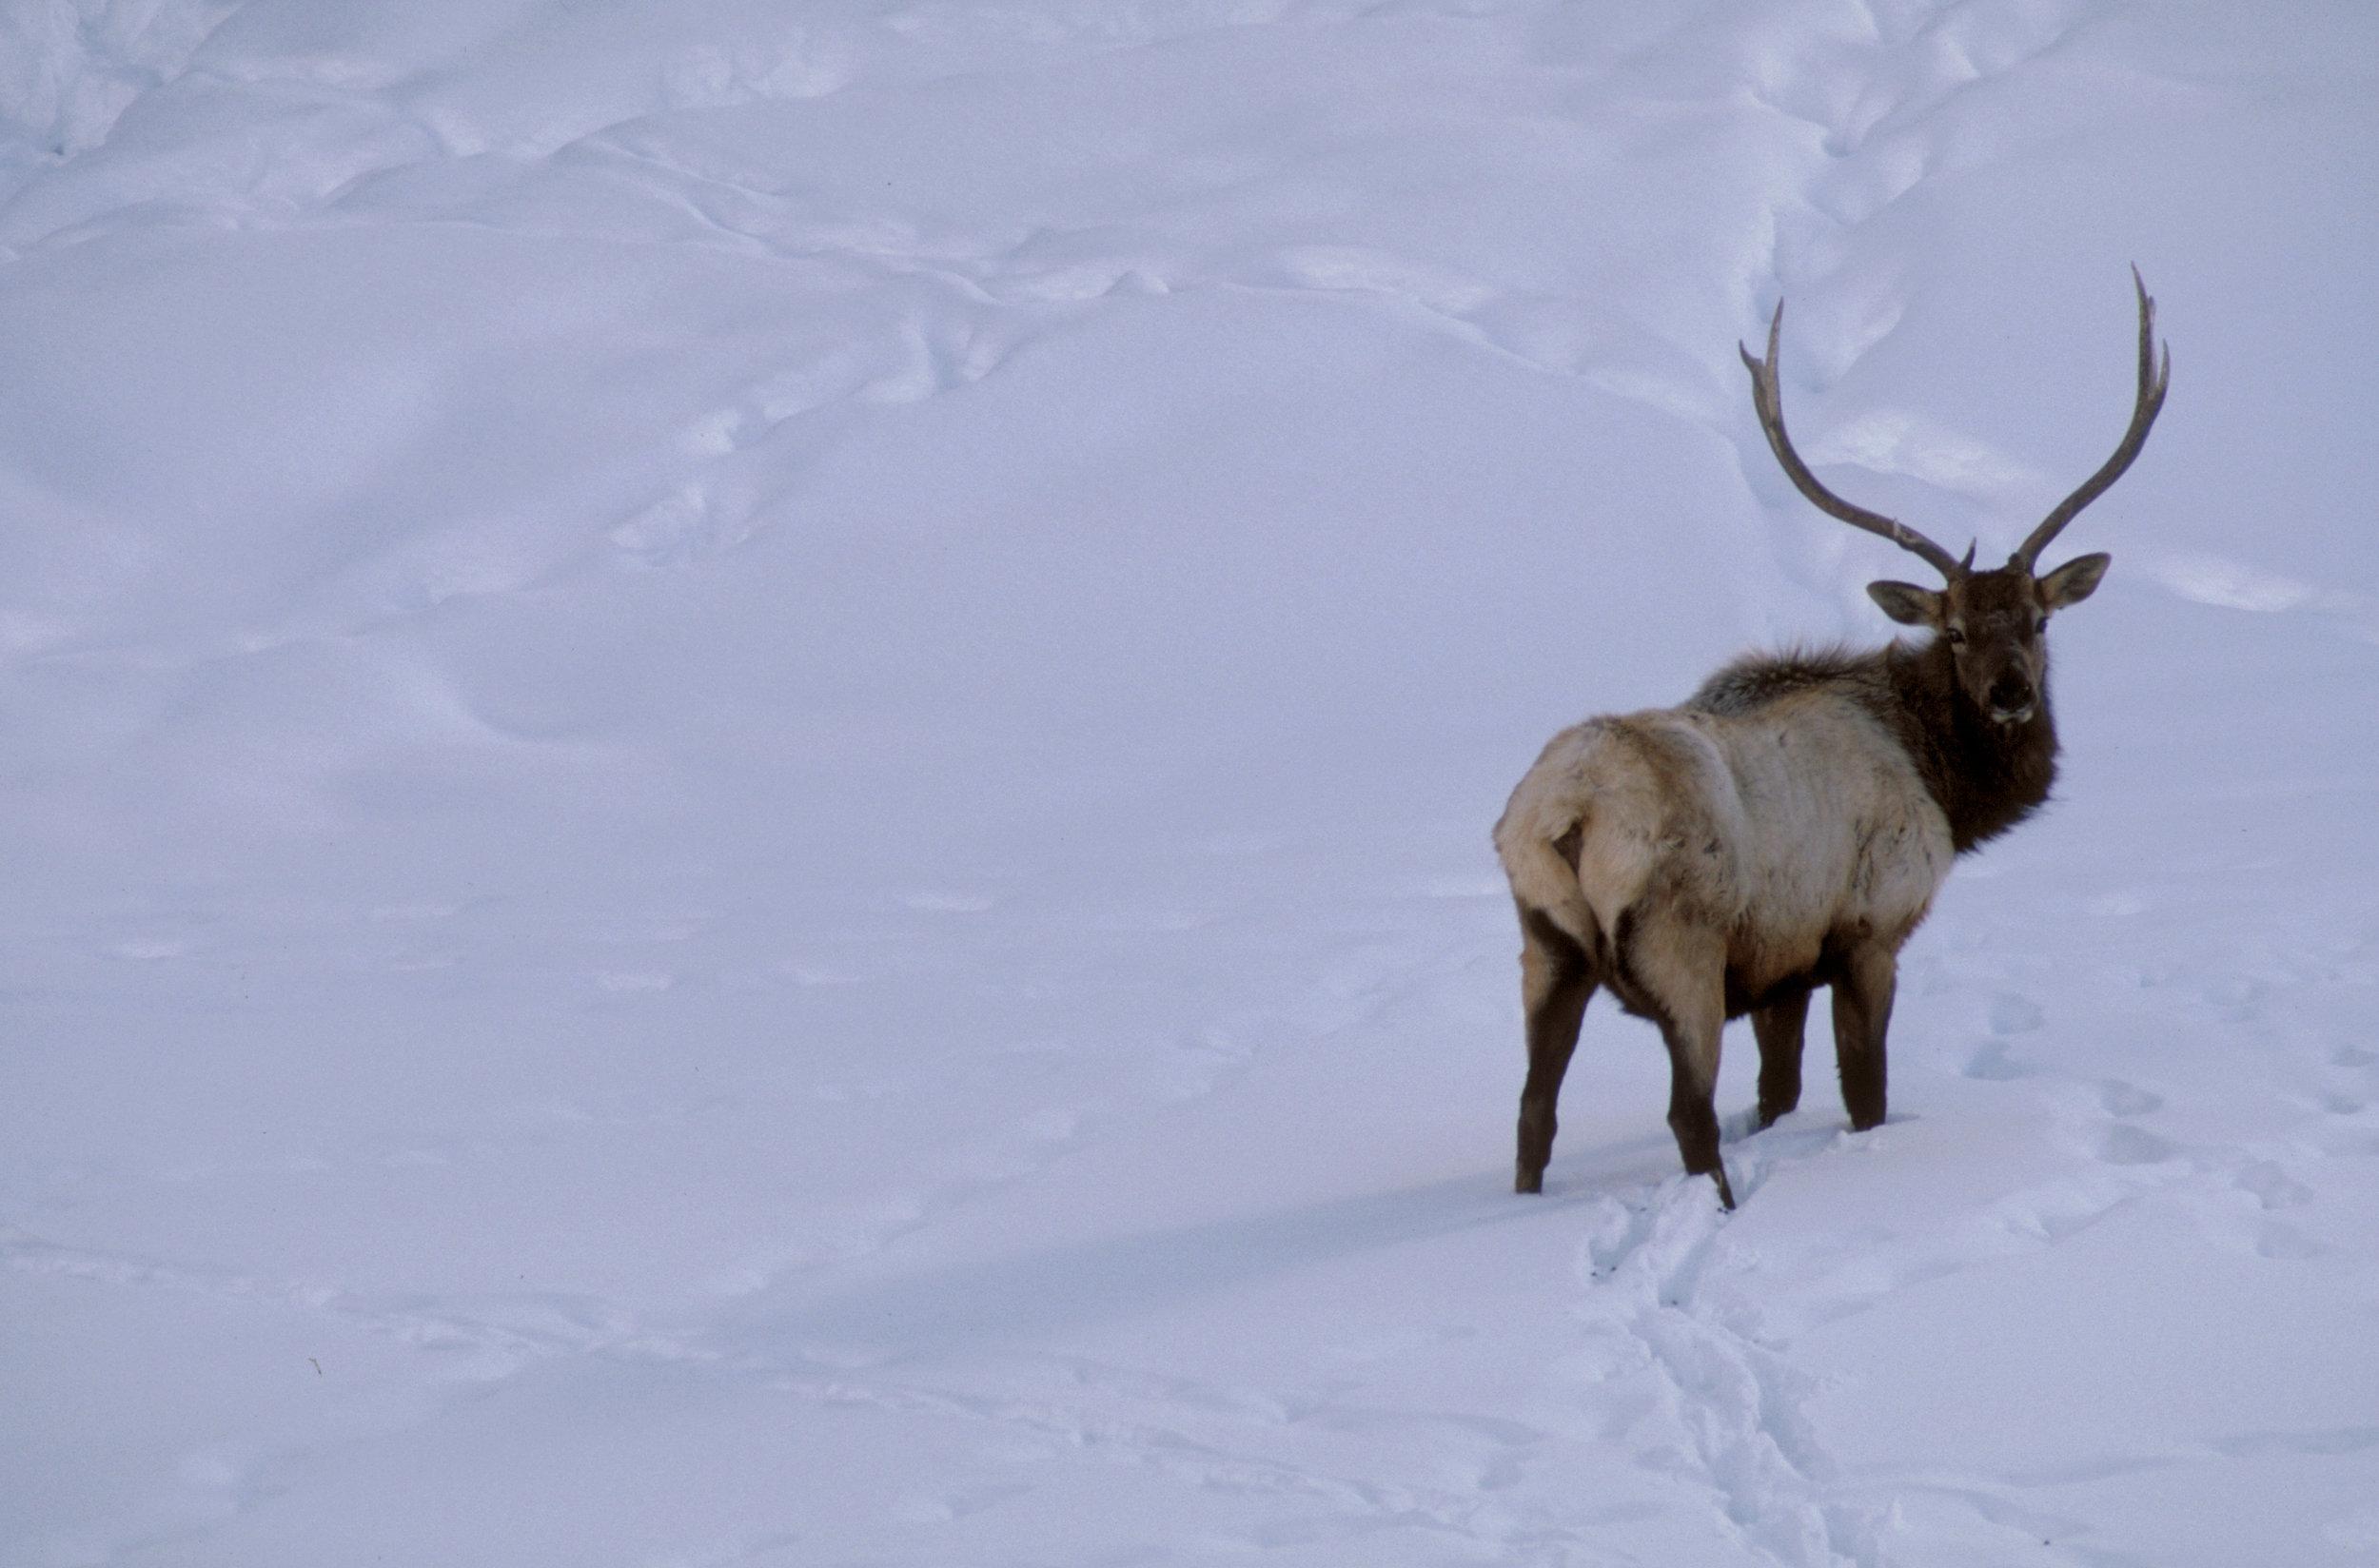 Winter elk standing in snow in Eastern Washington. Photo © Keith Lazelle.